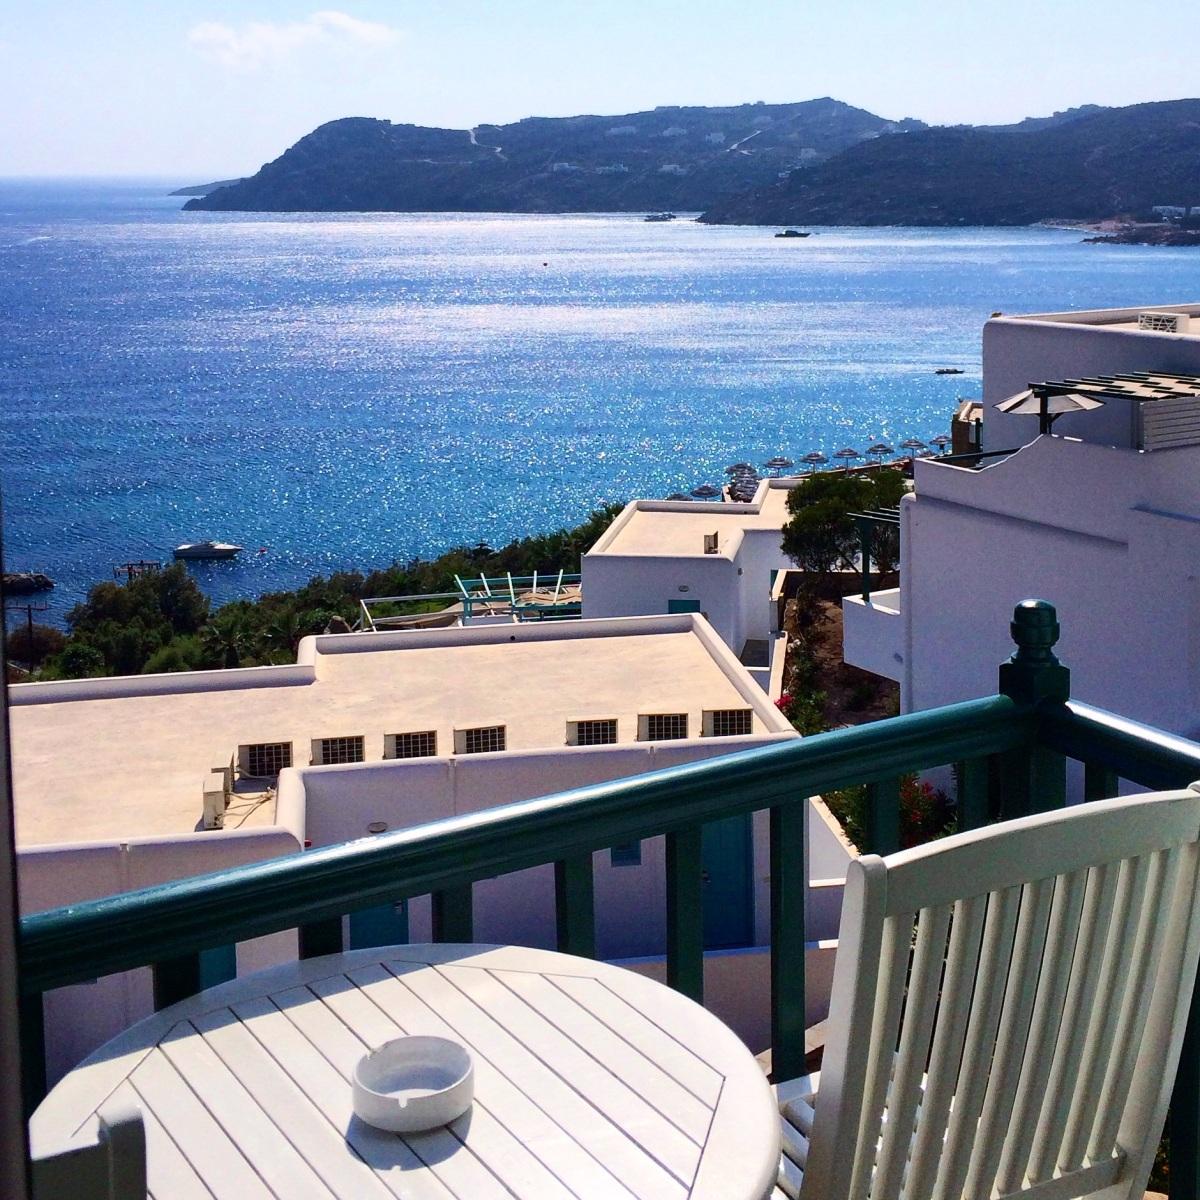 Mykonos: una splendida sorpresa! (Parte II - le spiagge)